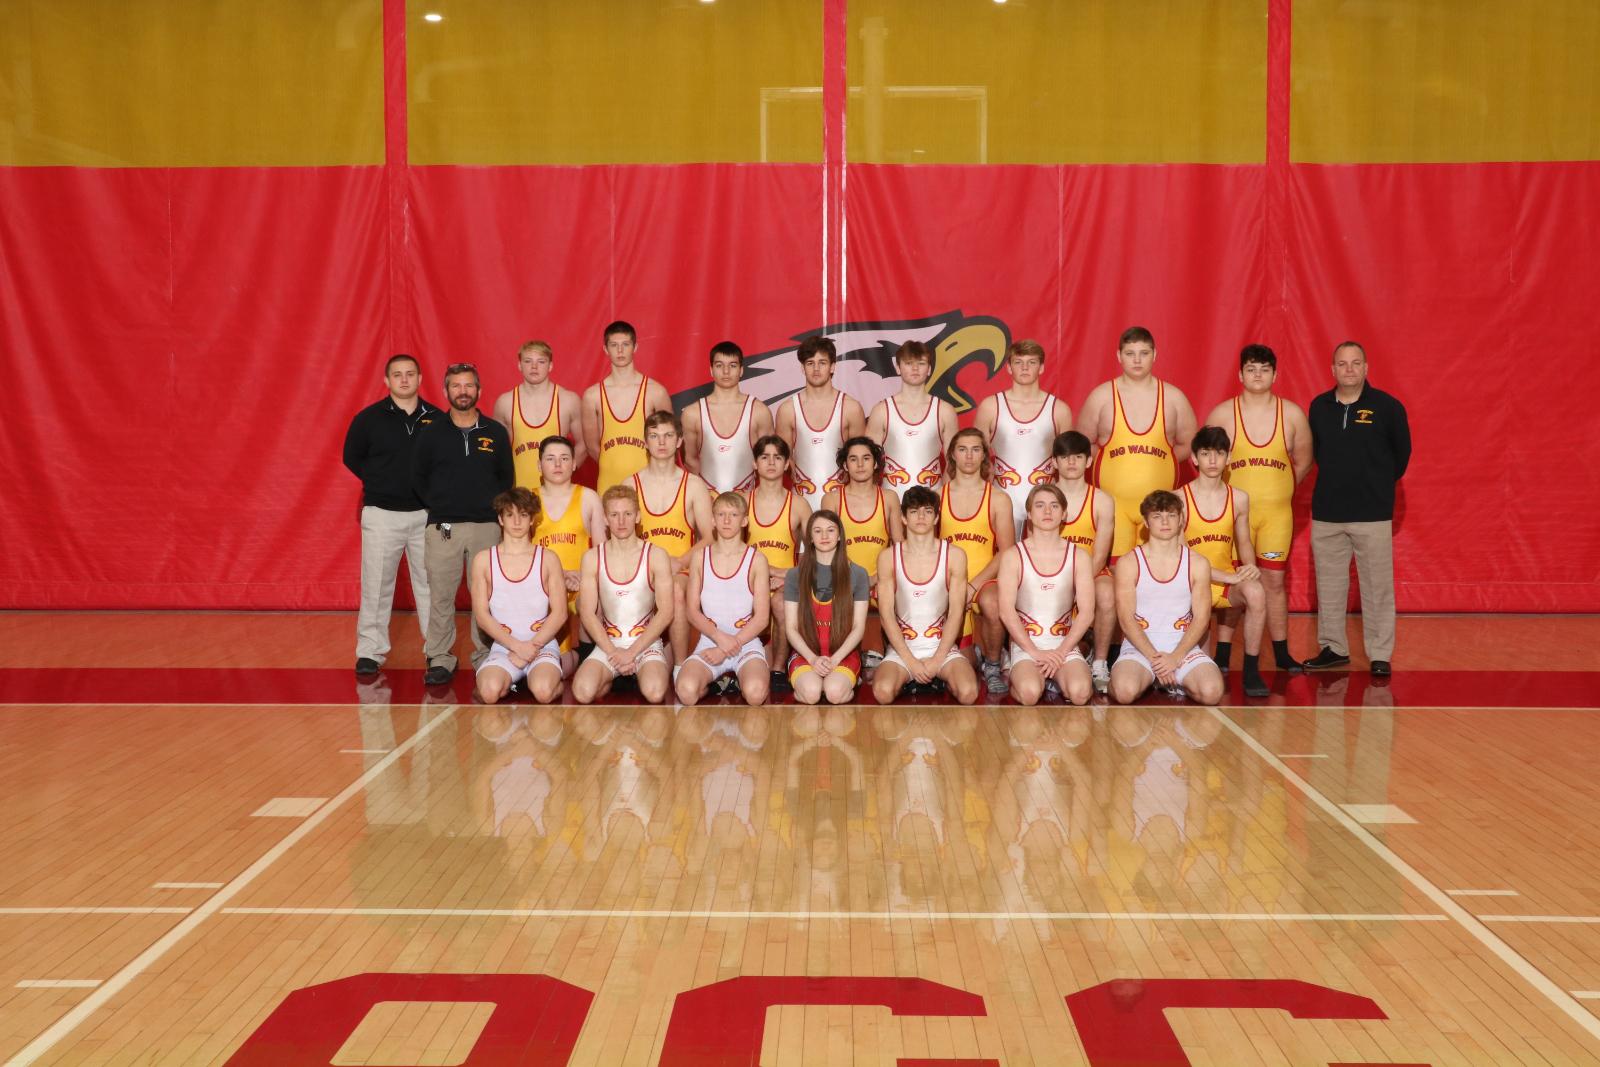 2020-2021 BWHS Winter Sports Teams